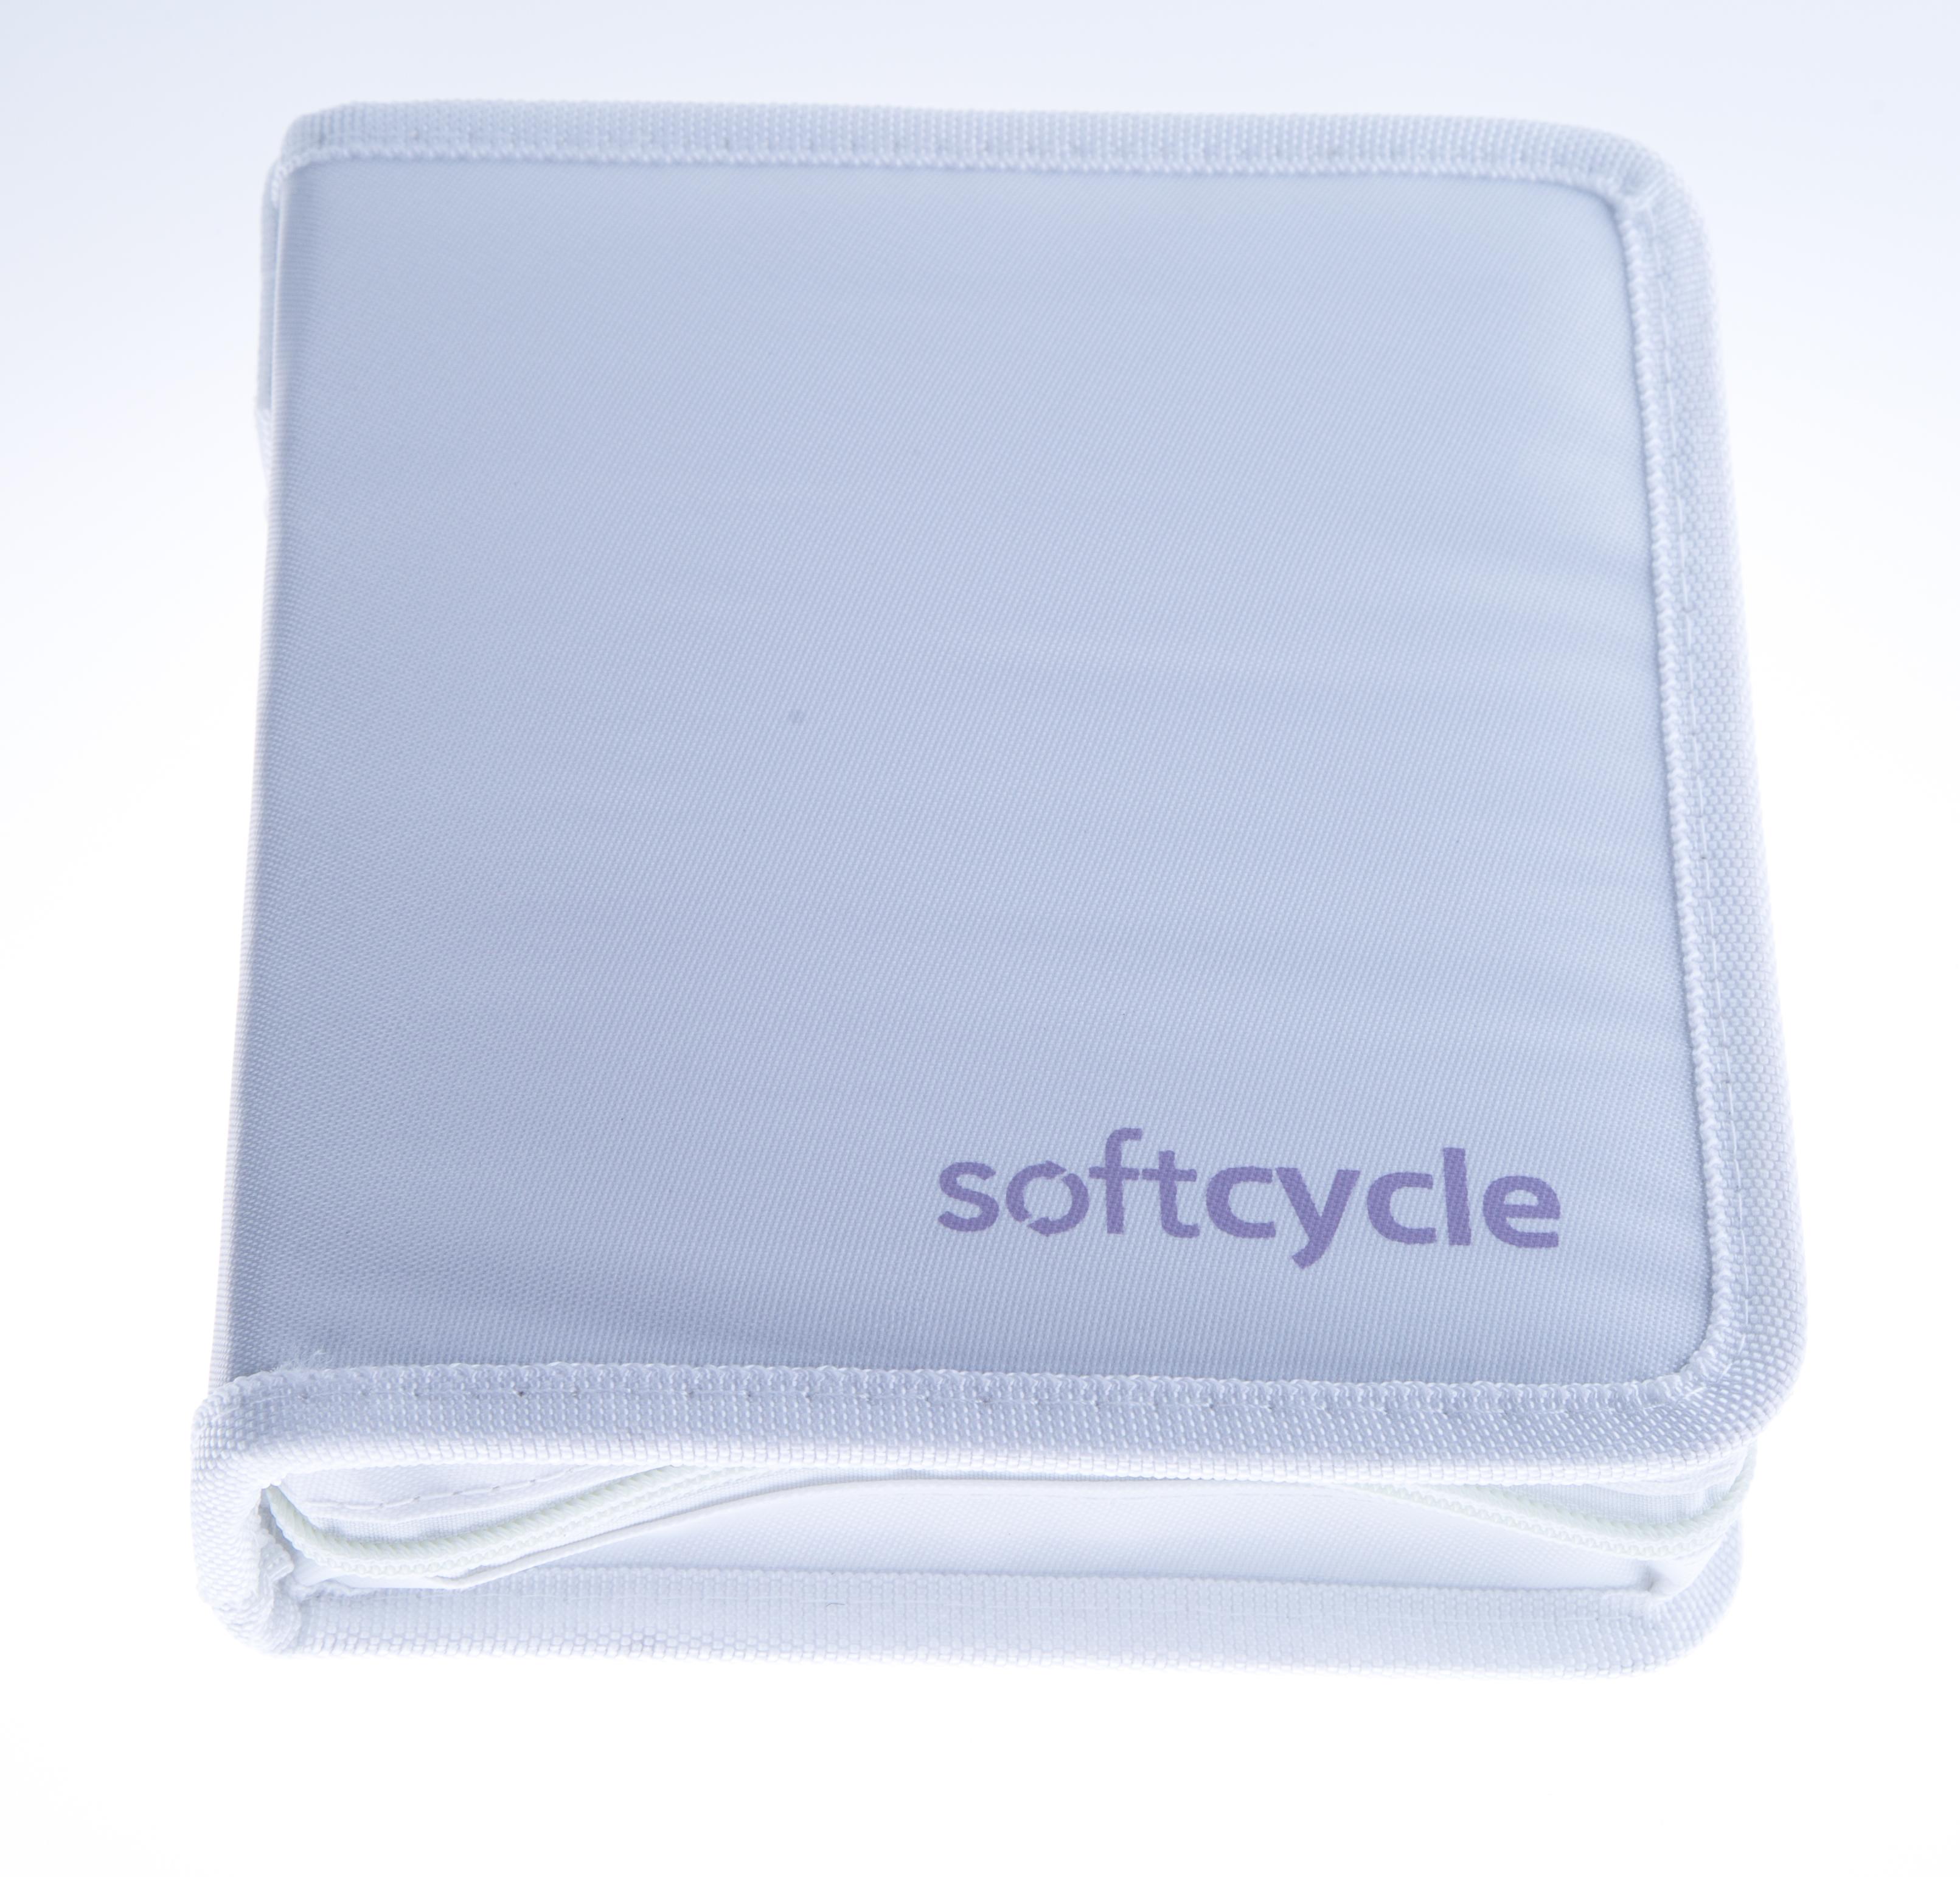 PMT Medical Softcycle Pelvic Floor Stimulator